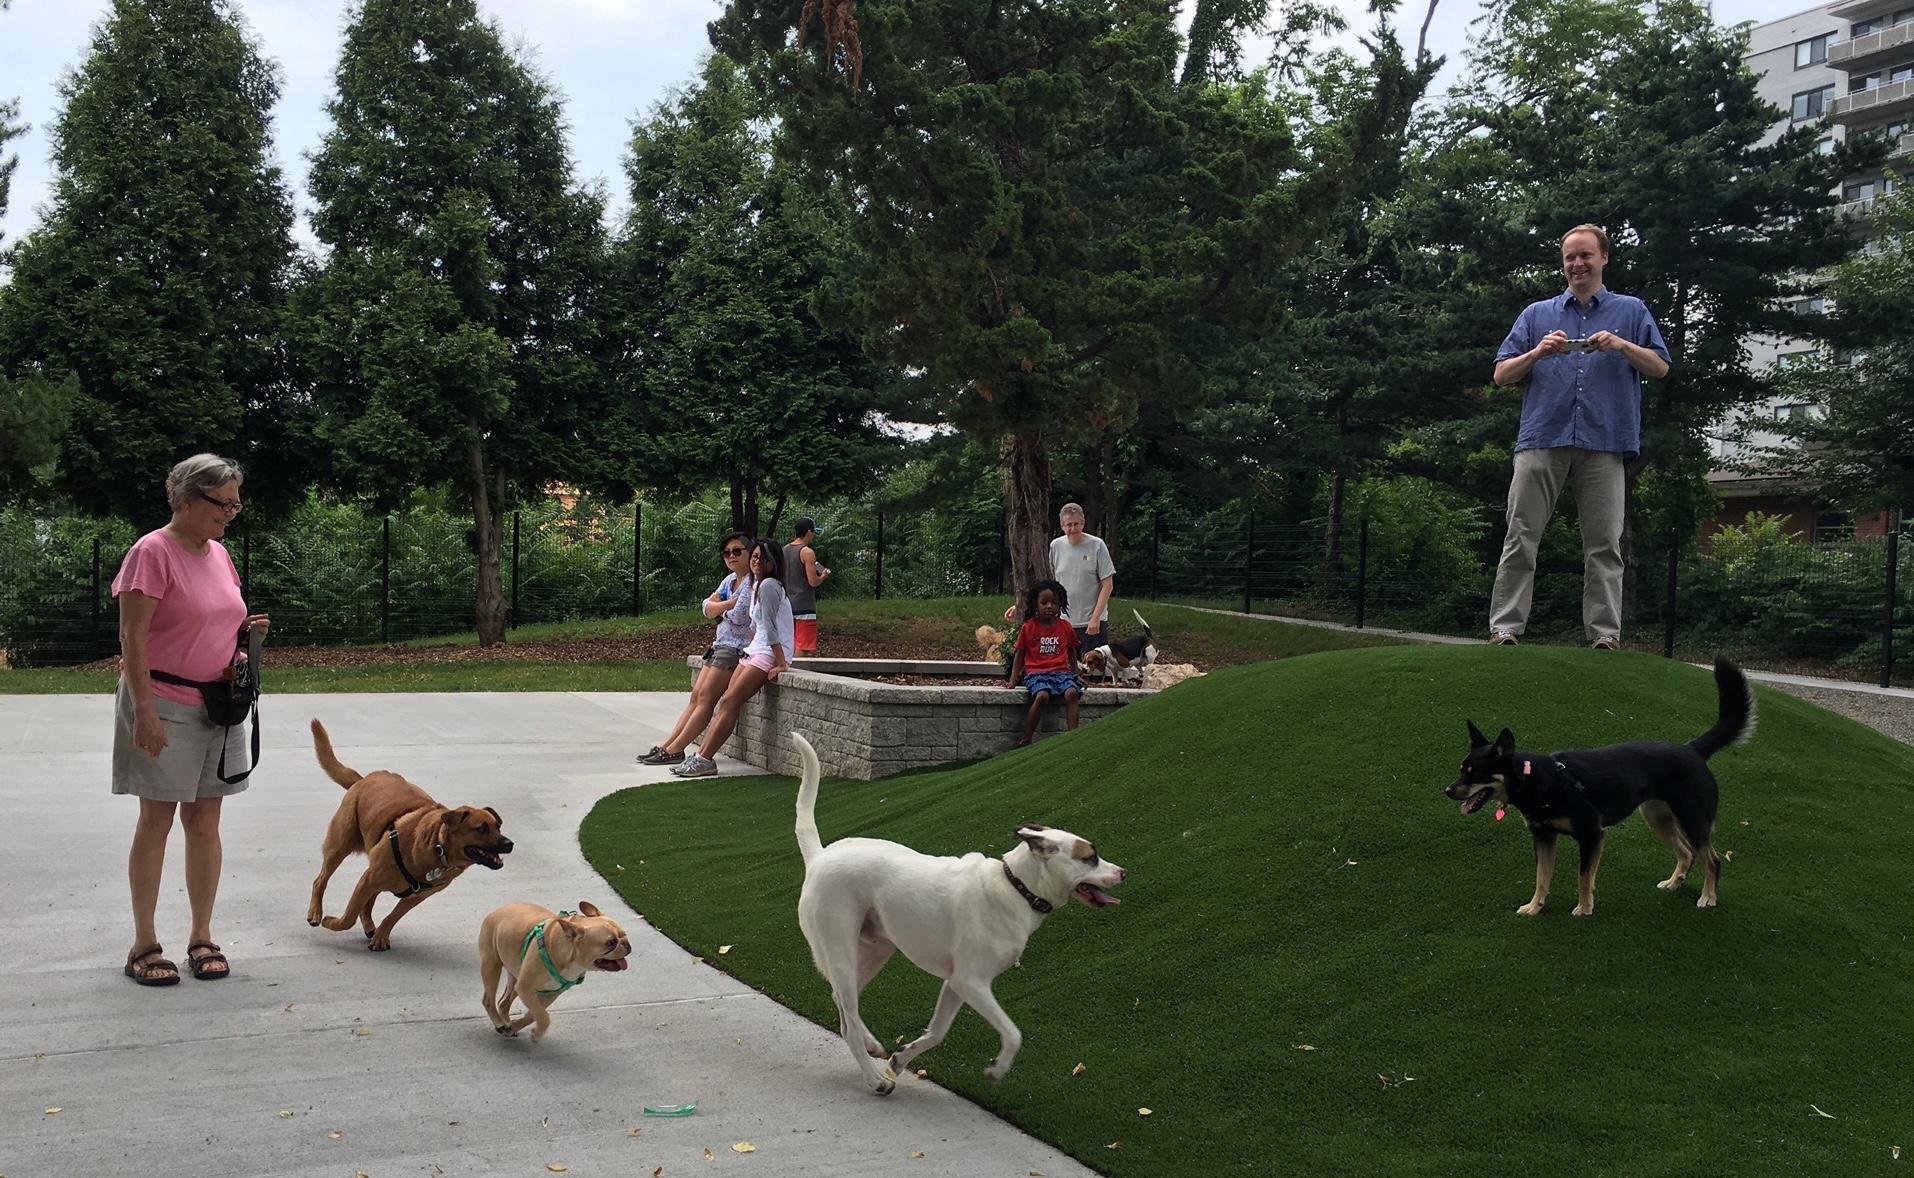 dog-chase-day-1-Ellsworth-Dog-Park.6.15.16.jpg